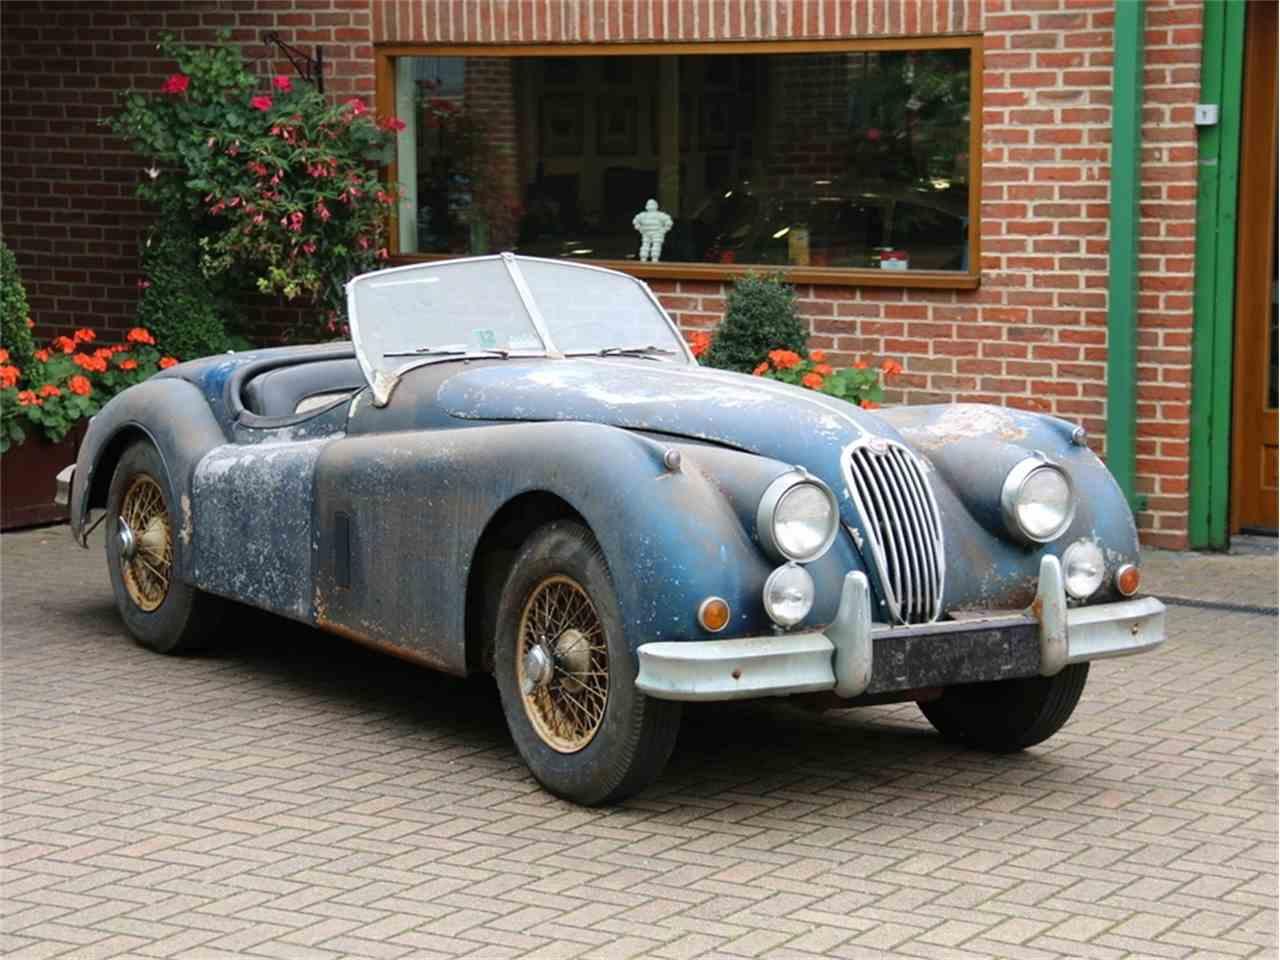 melbourne auction classic lot for shannons spring head fixed auctions jaguar sold coupe sale se